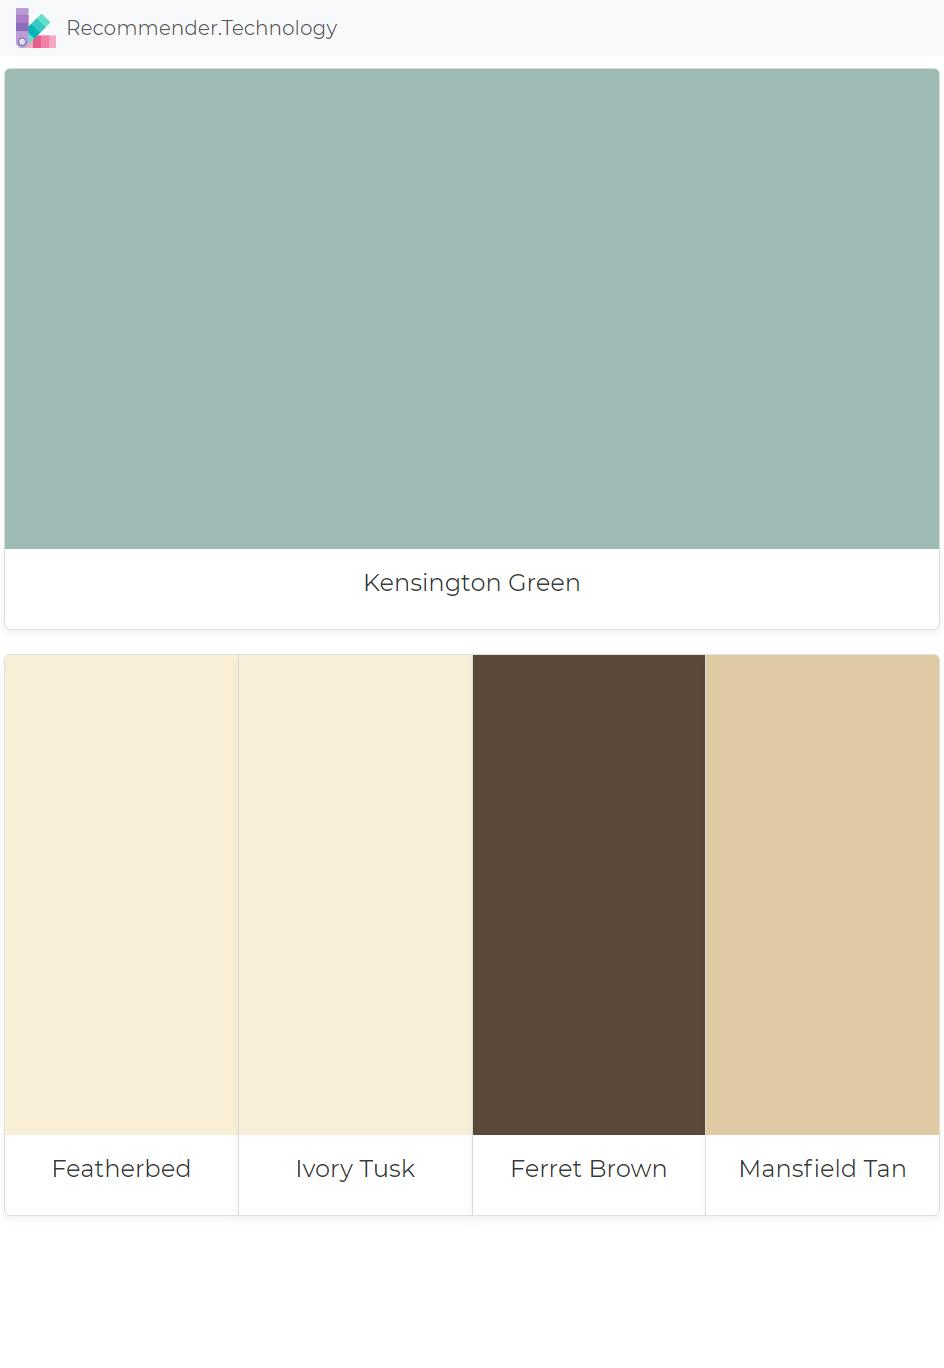 Kensington Green Featherbed Ivory Tusk Ferret Brown